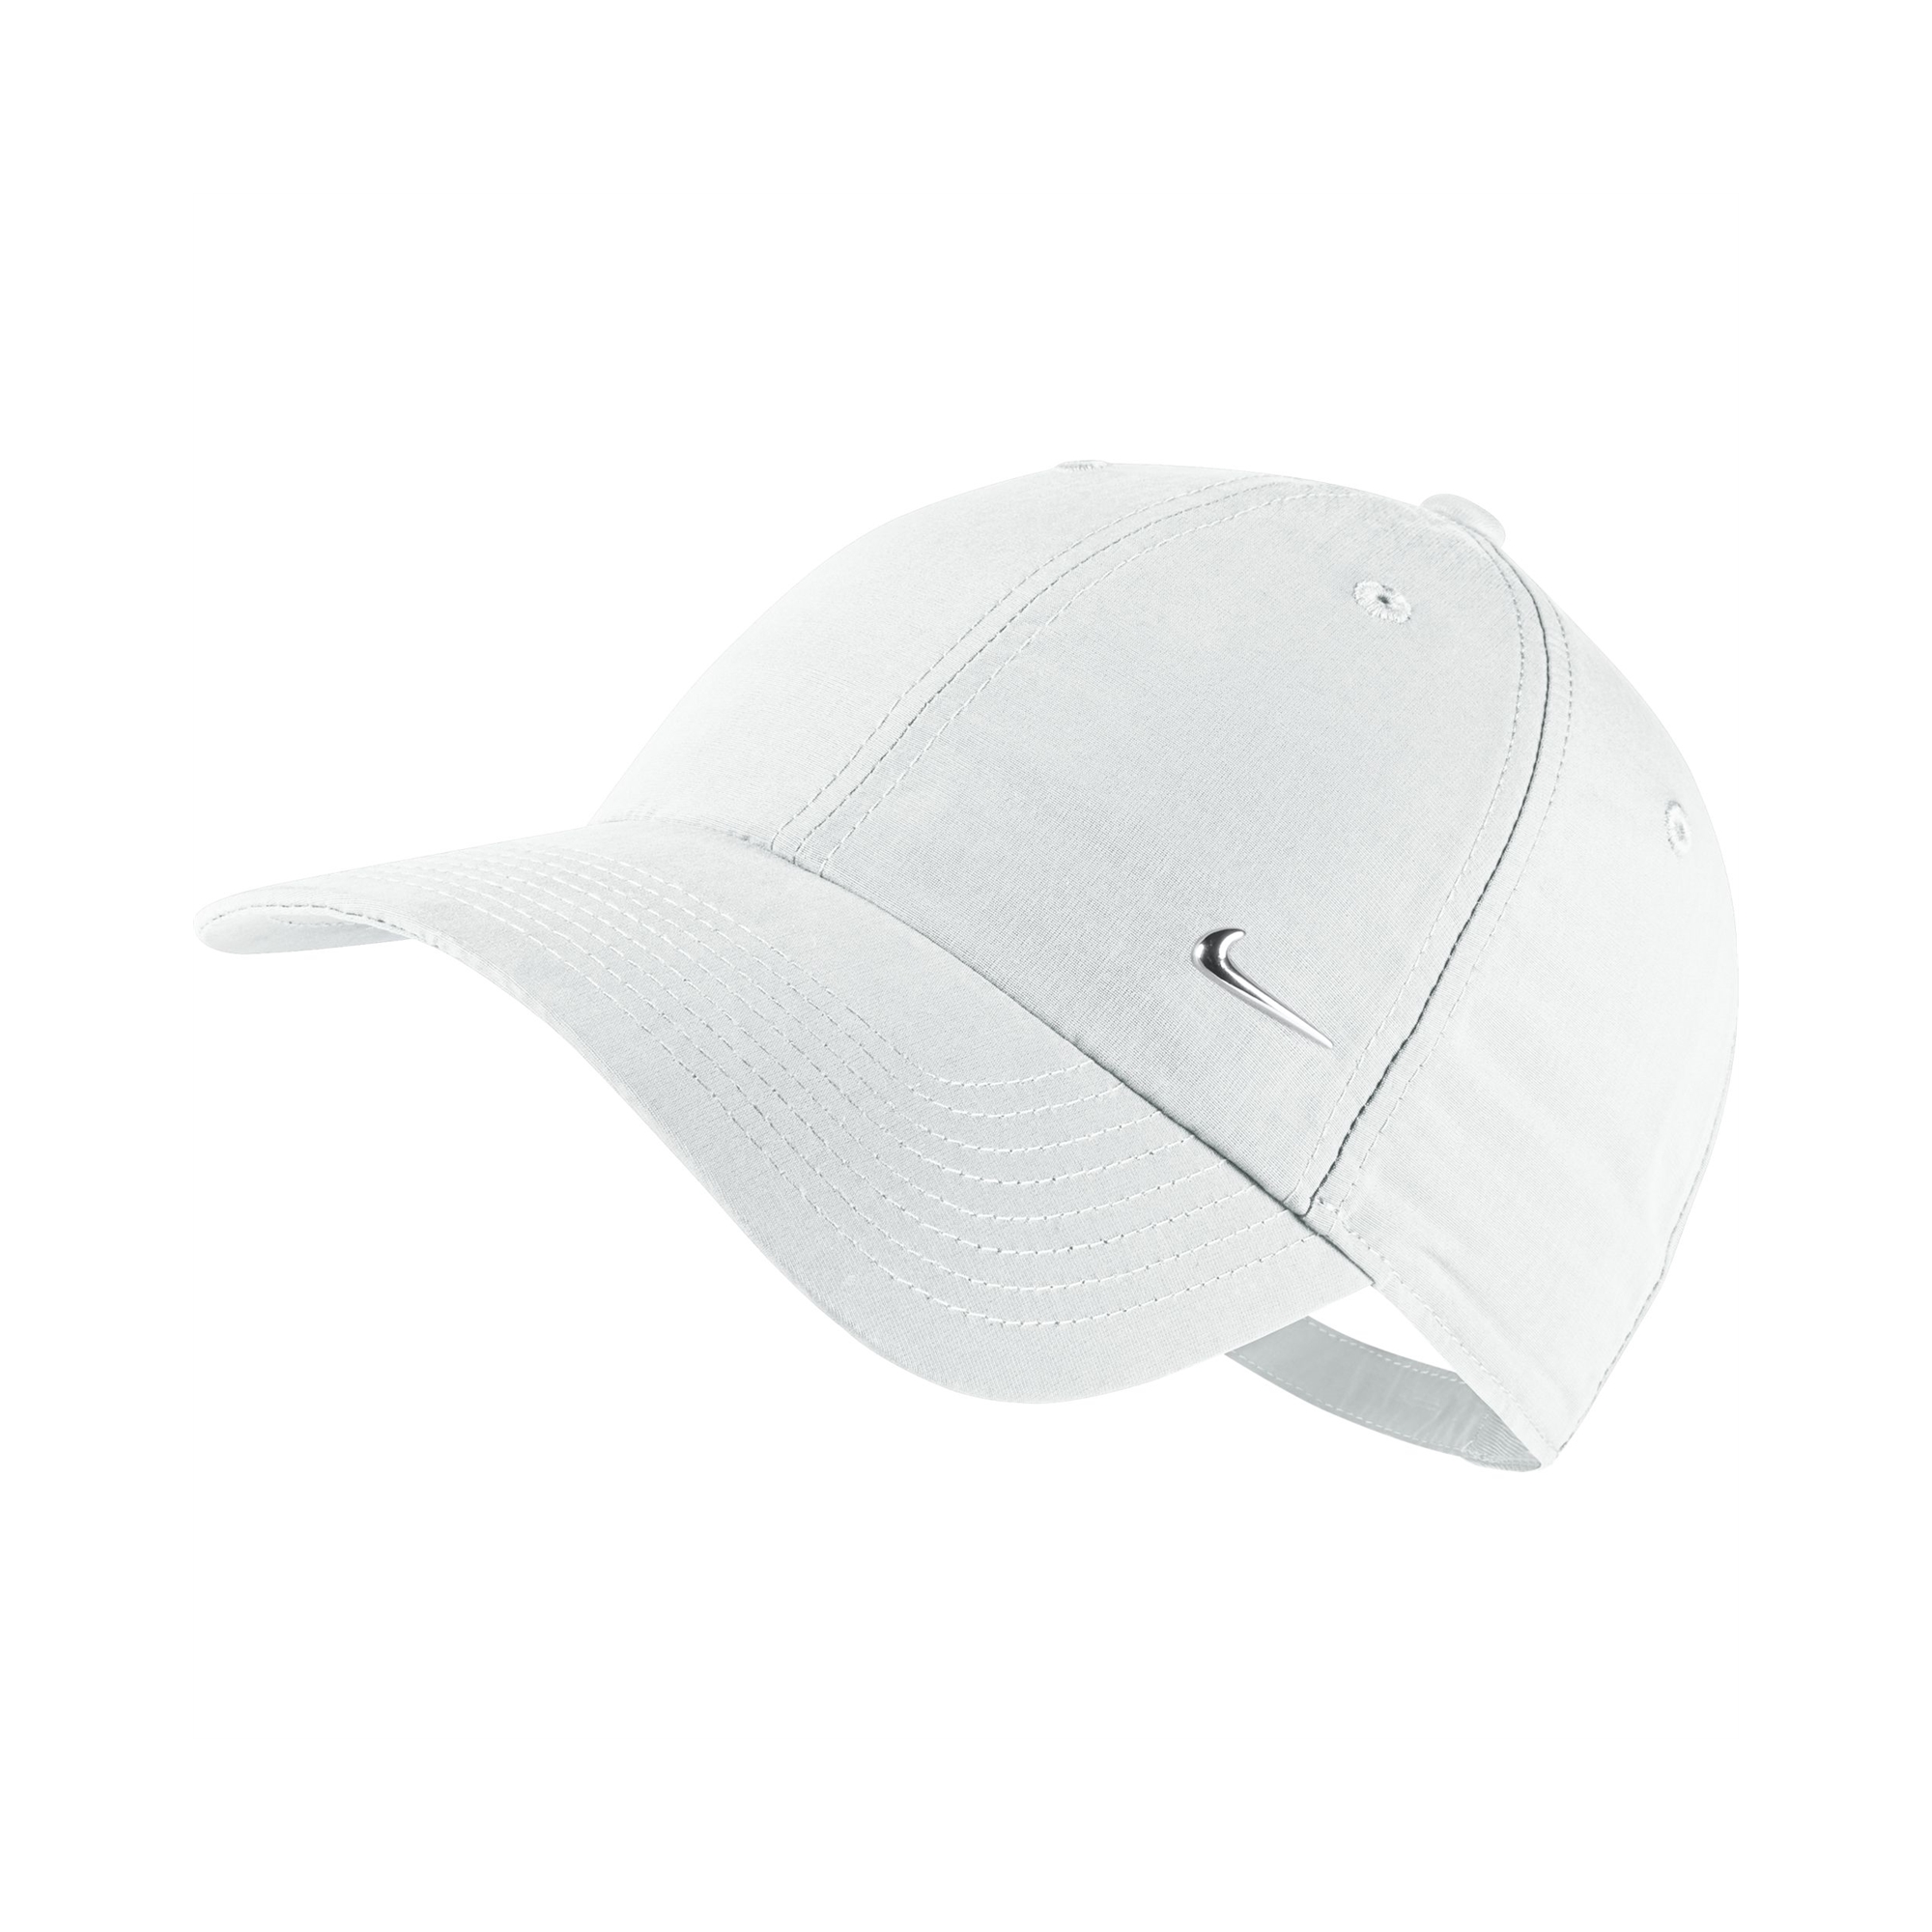 nike swoosh logo sport cap white